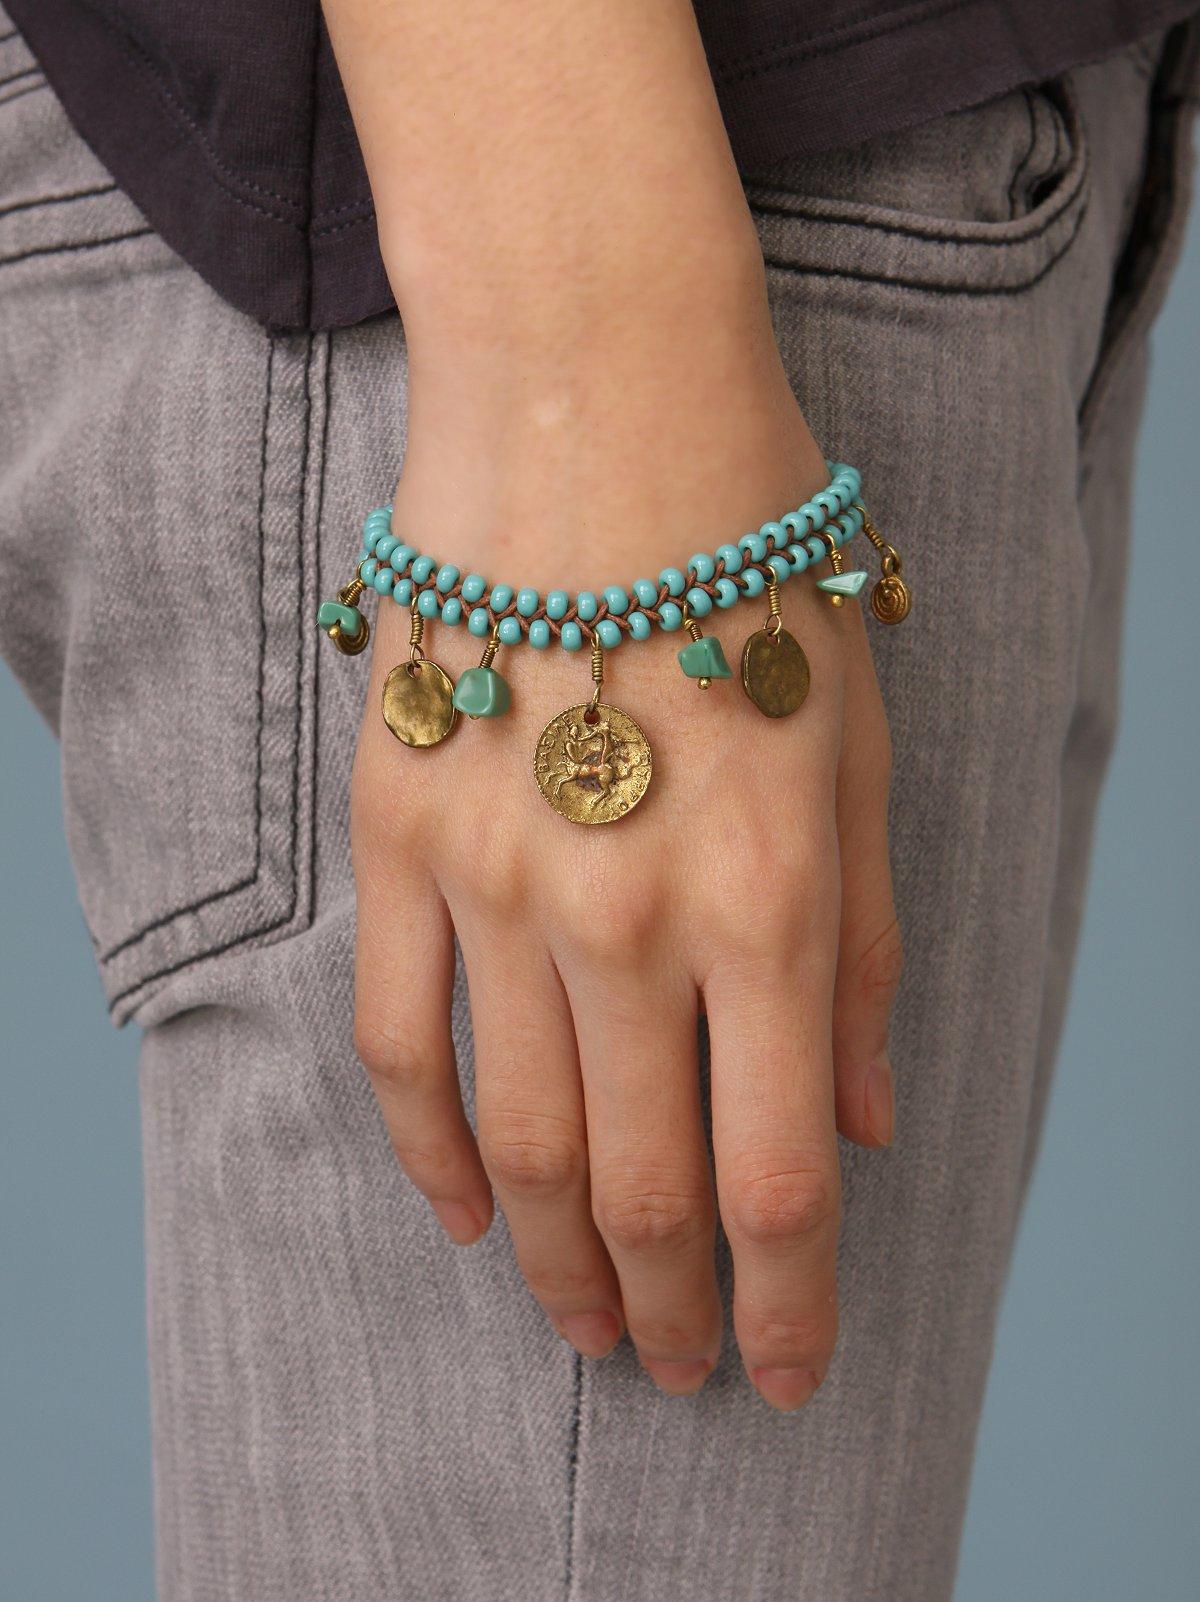 Beading Turquoise & Coin Bracelet